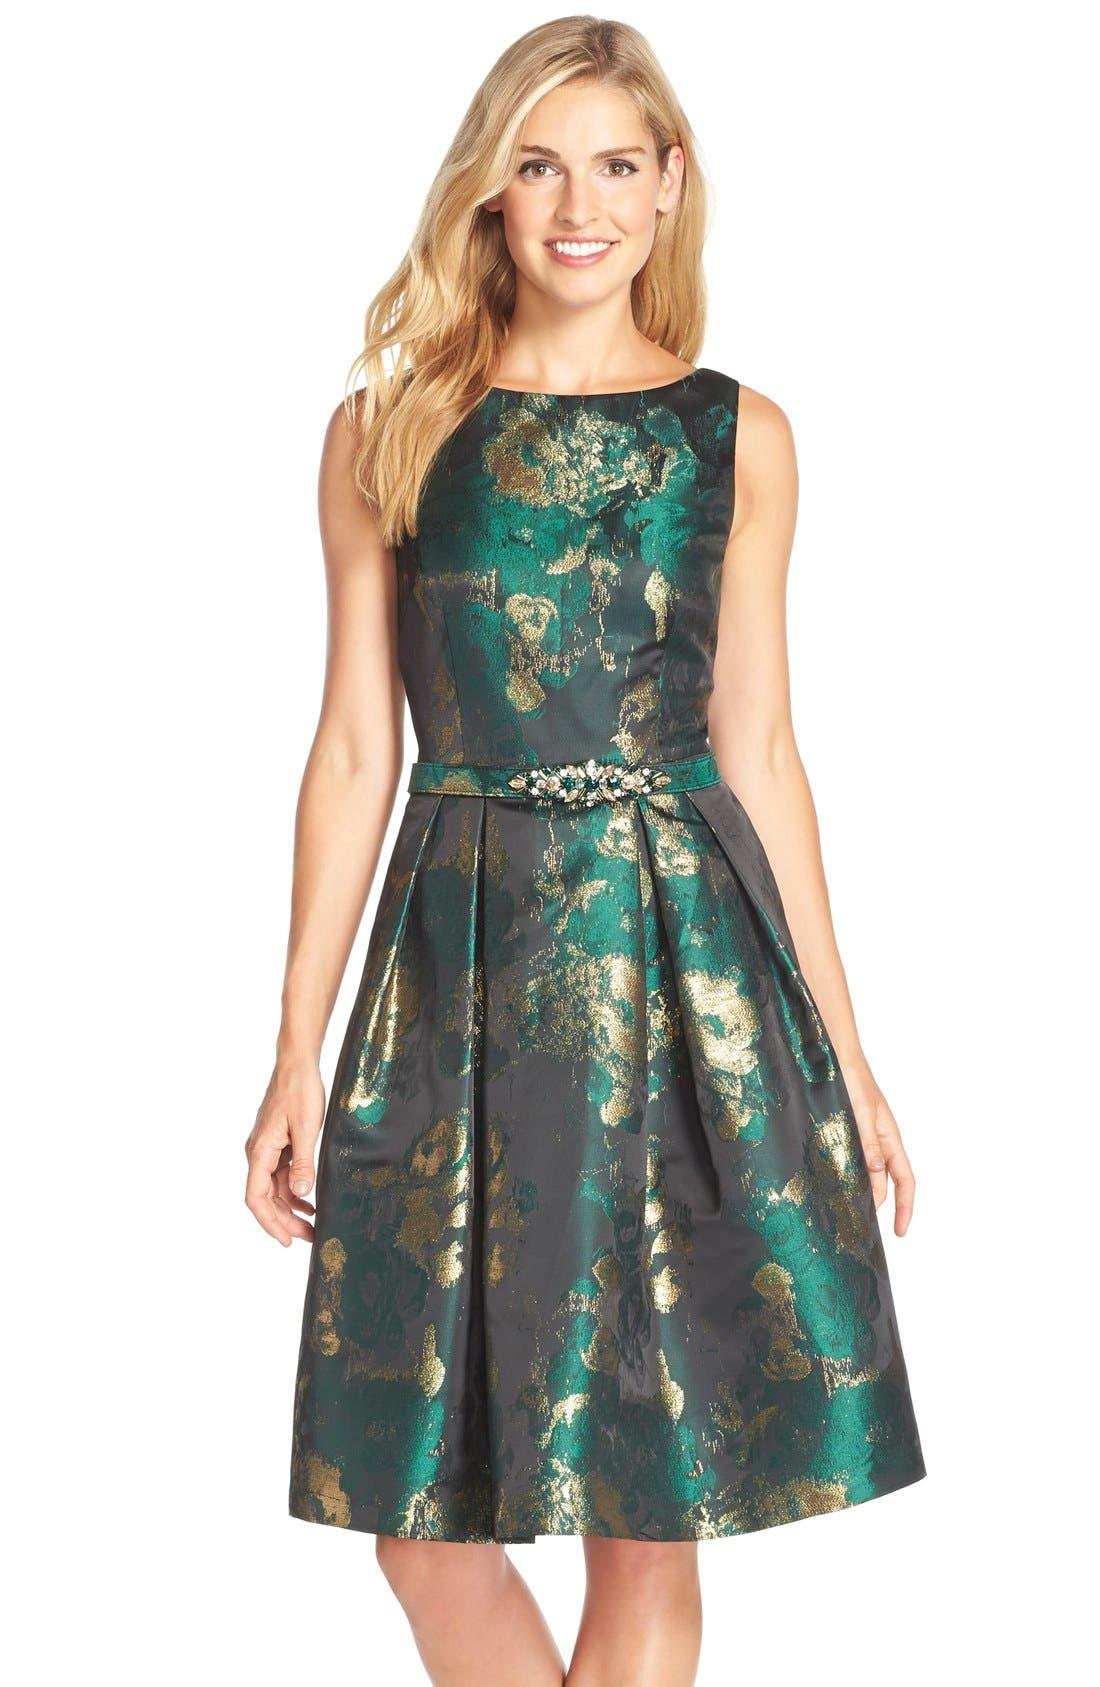 Nordstrom Rack Dresses